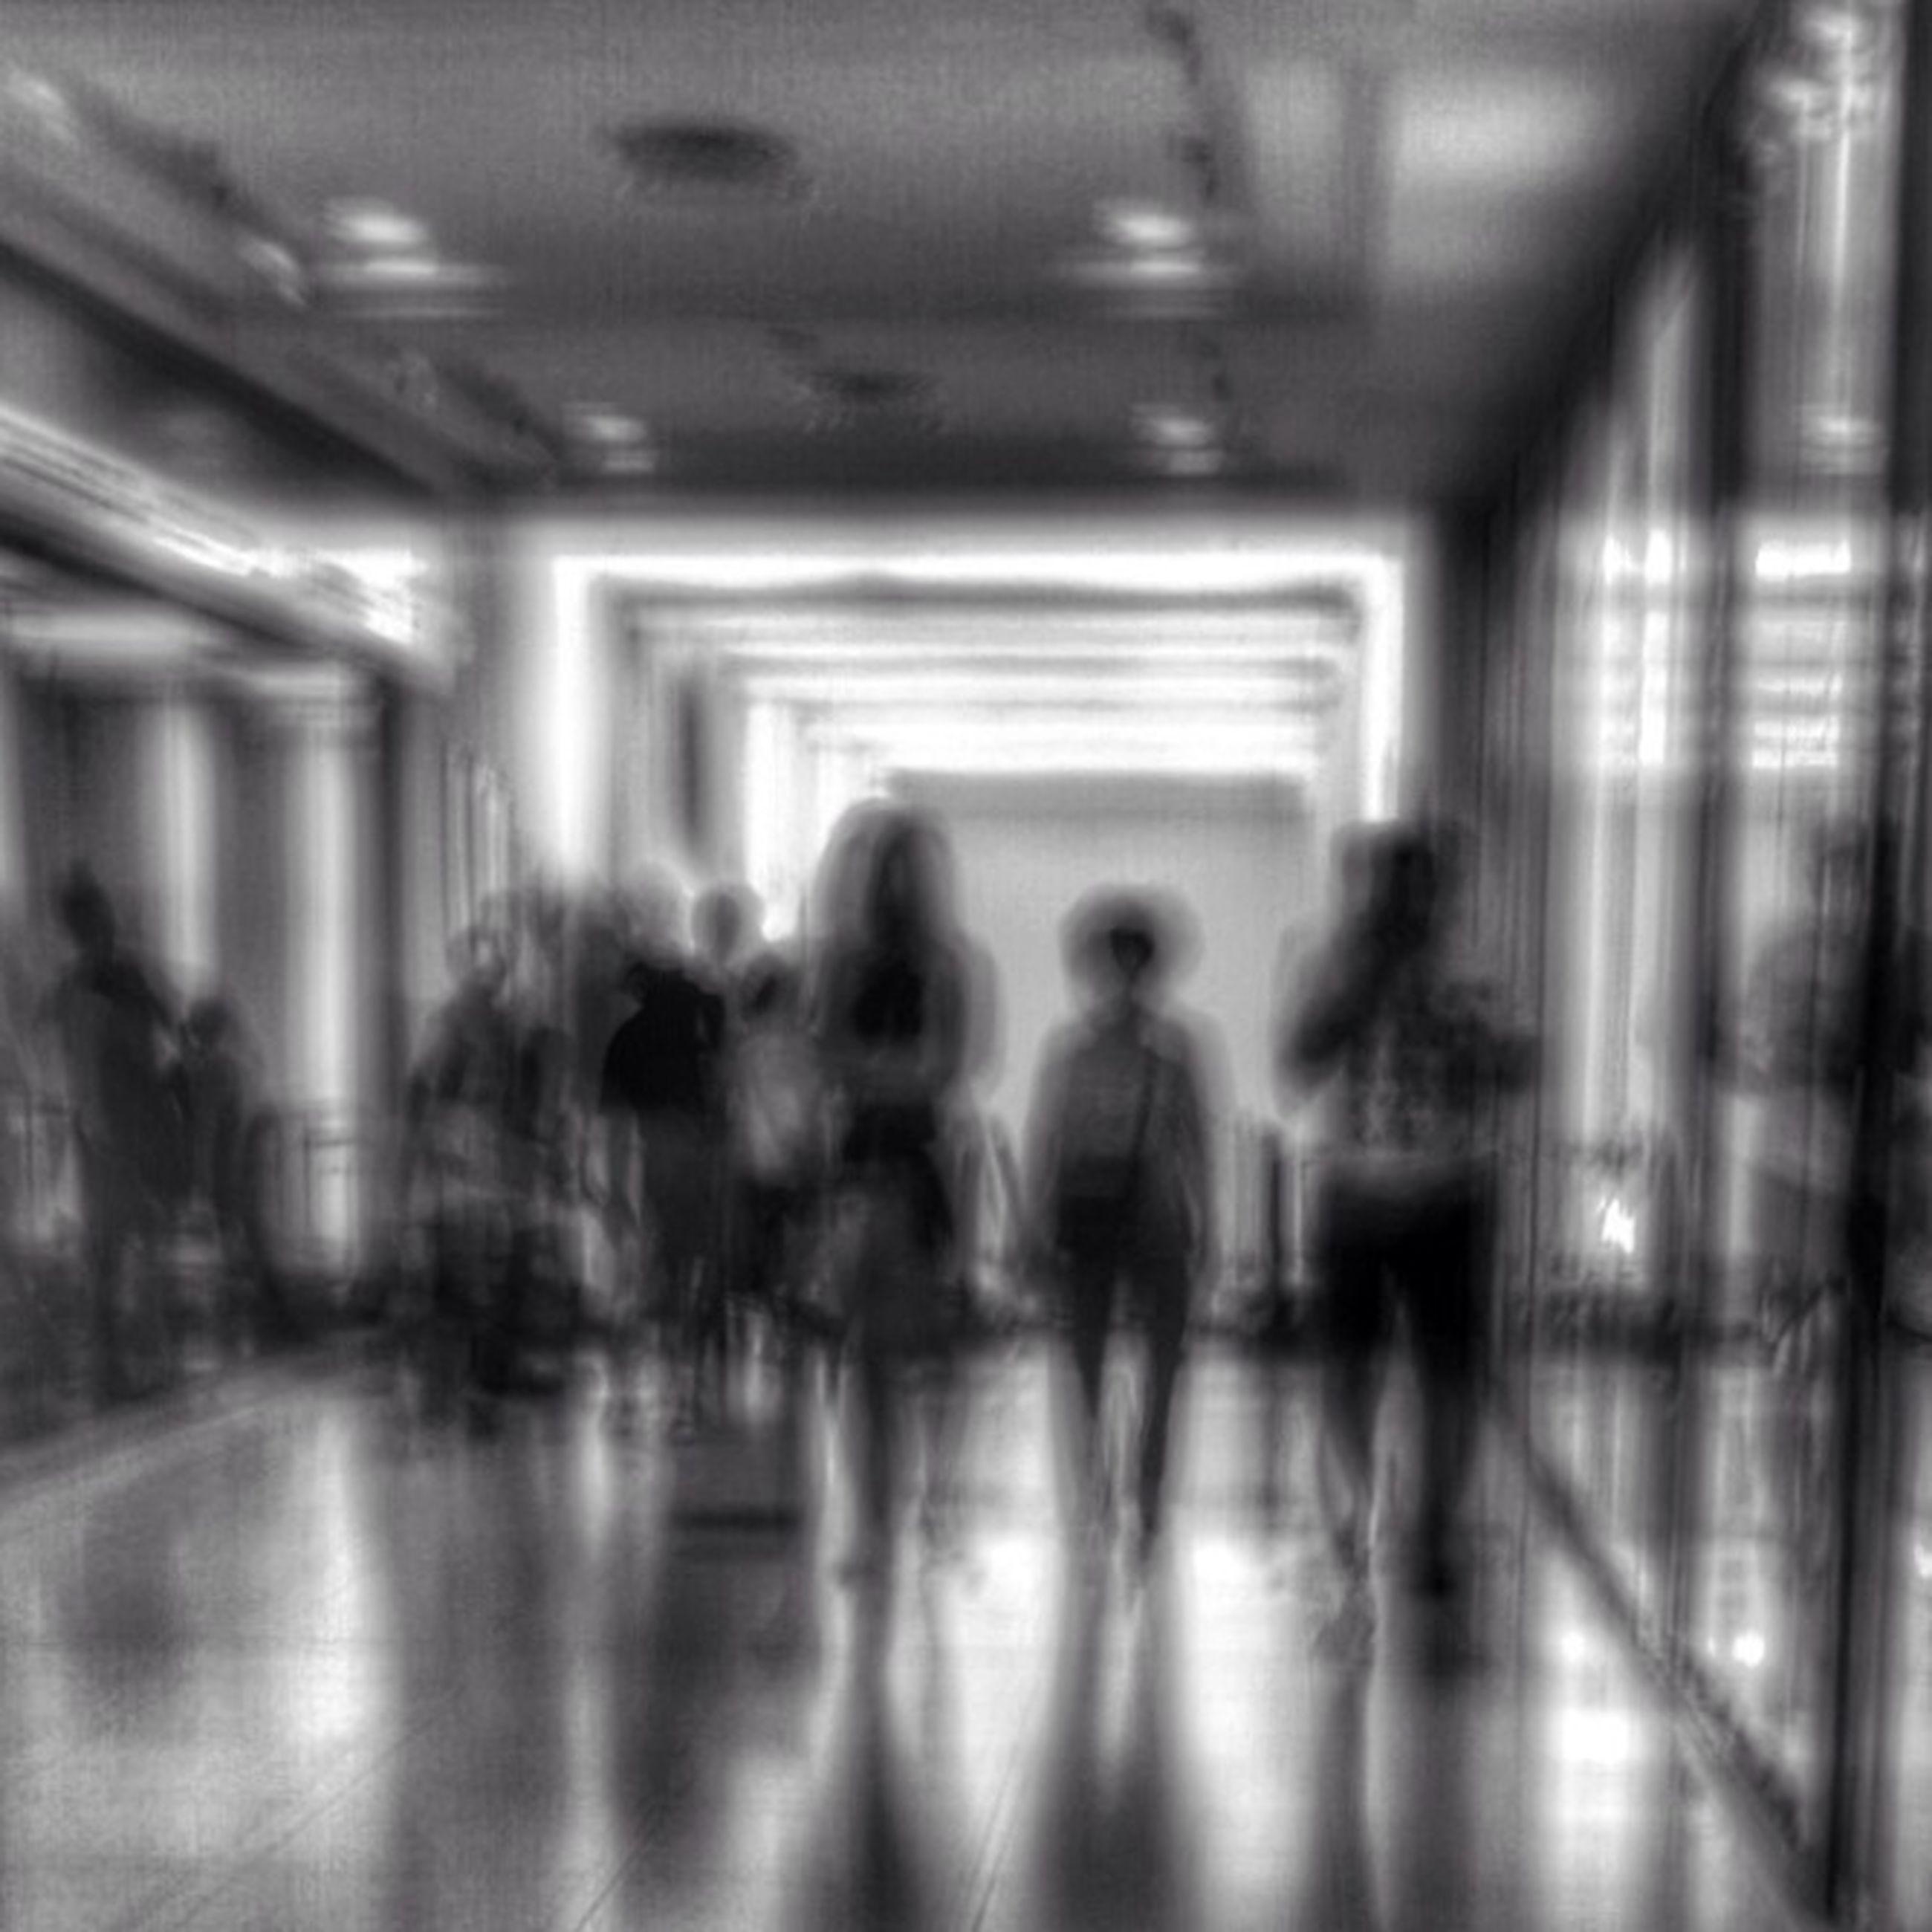 indoors, men, lifestyles, person, public transportation, walking, illuminated, transportation, passenger, subway station, leisure activity, subway, blurred motion, ceiling, railroad station, travel, medium group of people, corridor, large group of people